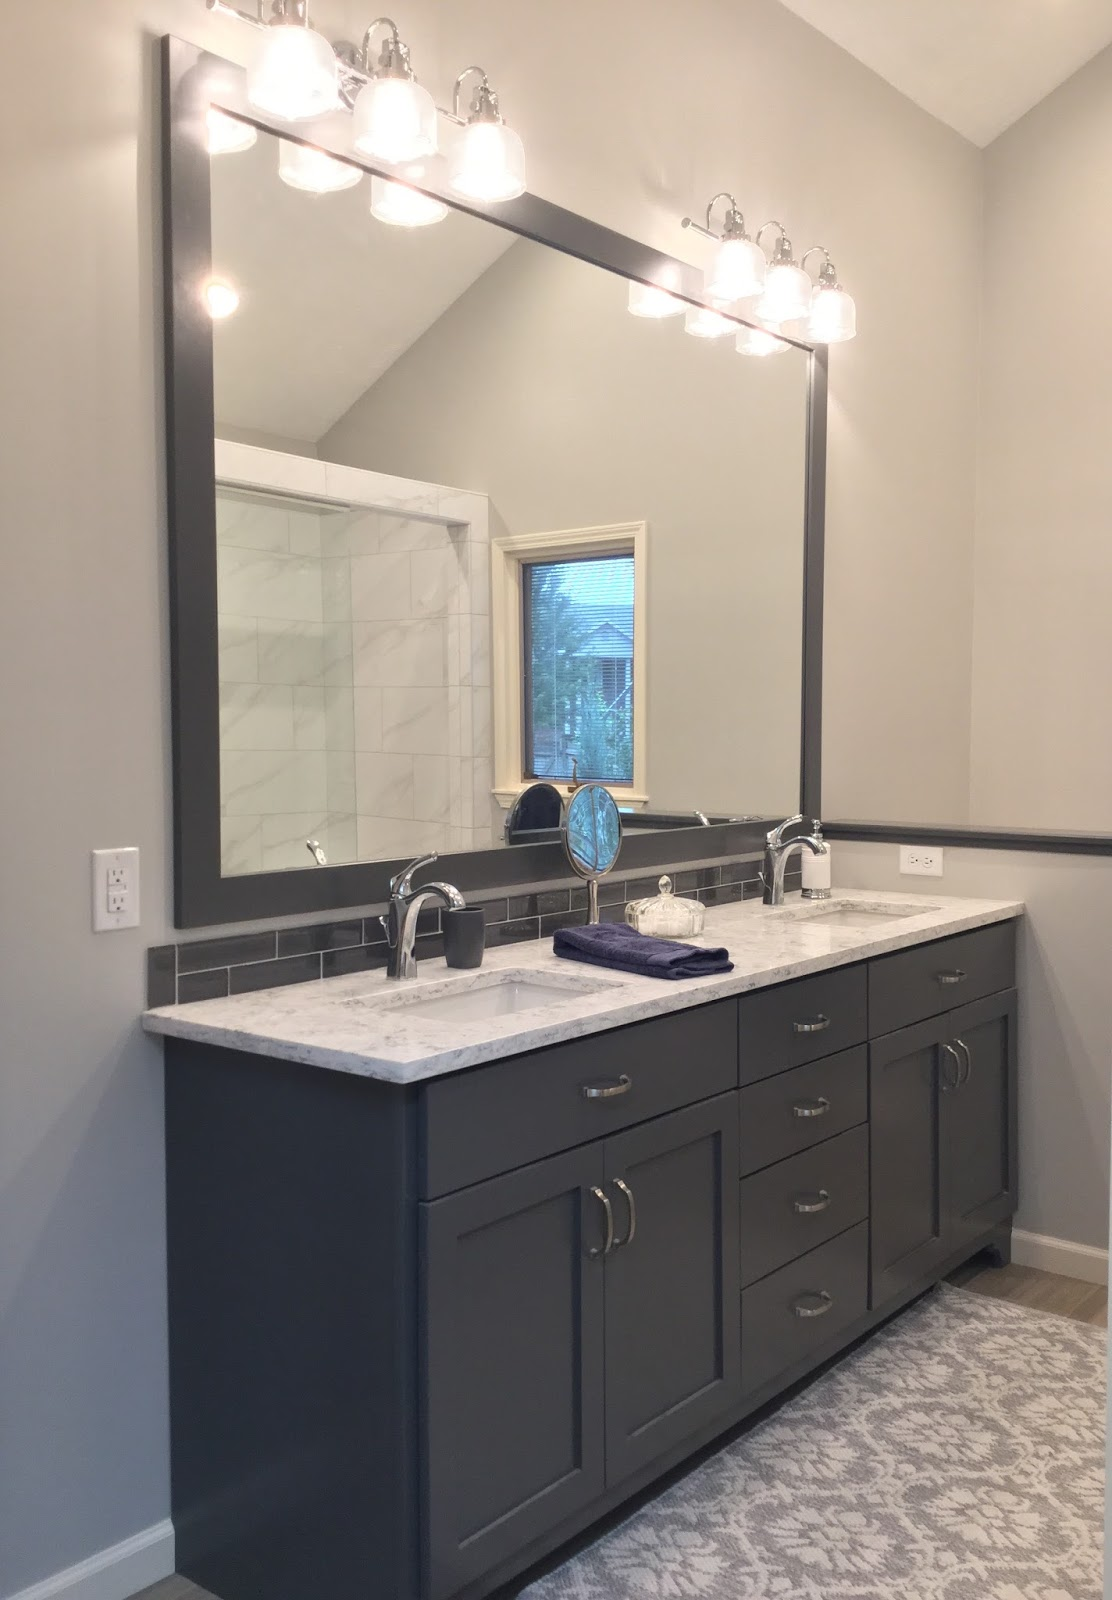 HOW TO REDESIGN A MASTER BATHROOM LAYOUT ELZ DESIGN - Bathroom re design